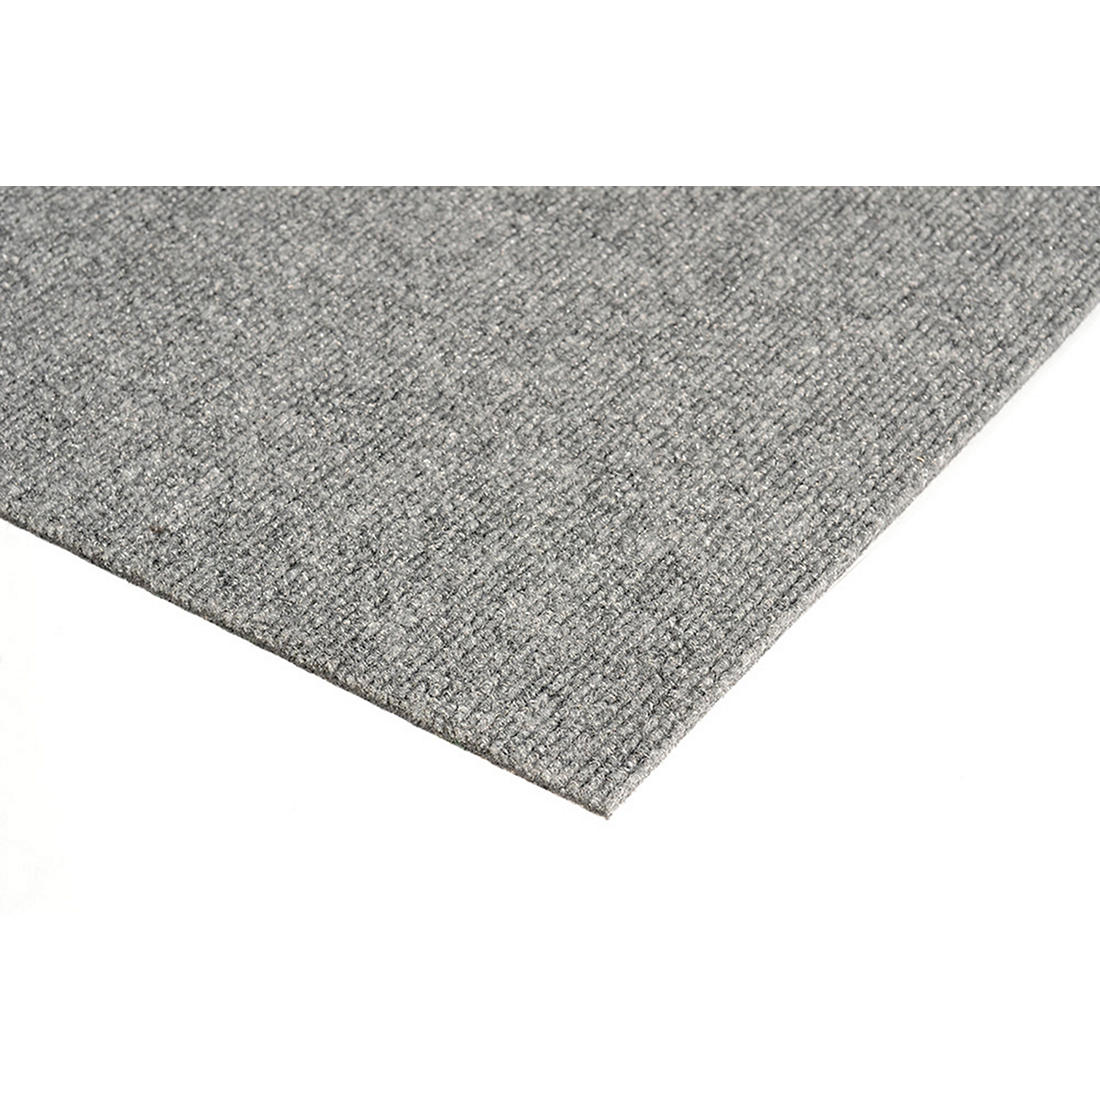 Foss Floors 18 X Carpet Tiles